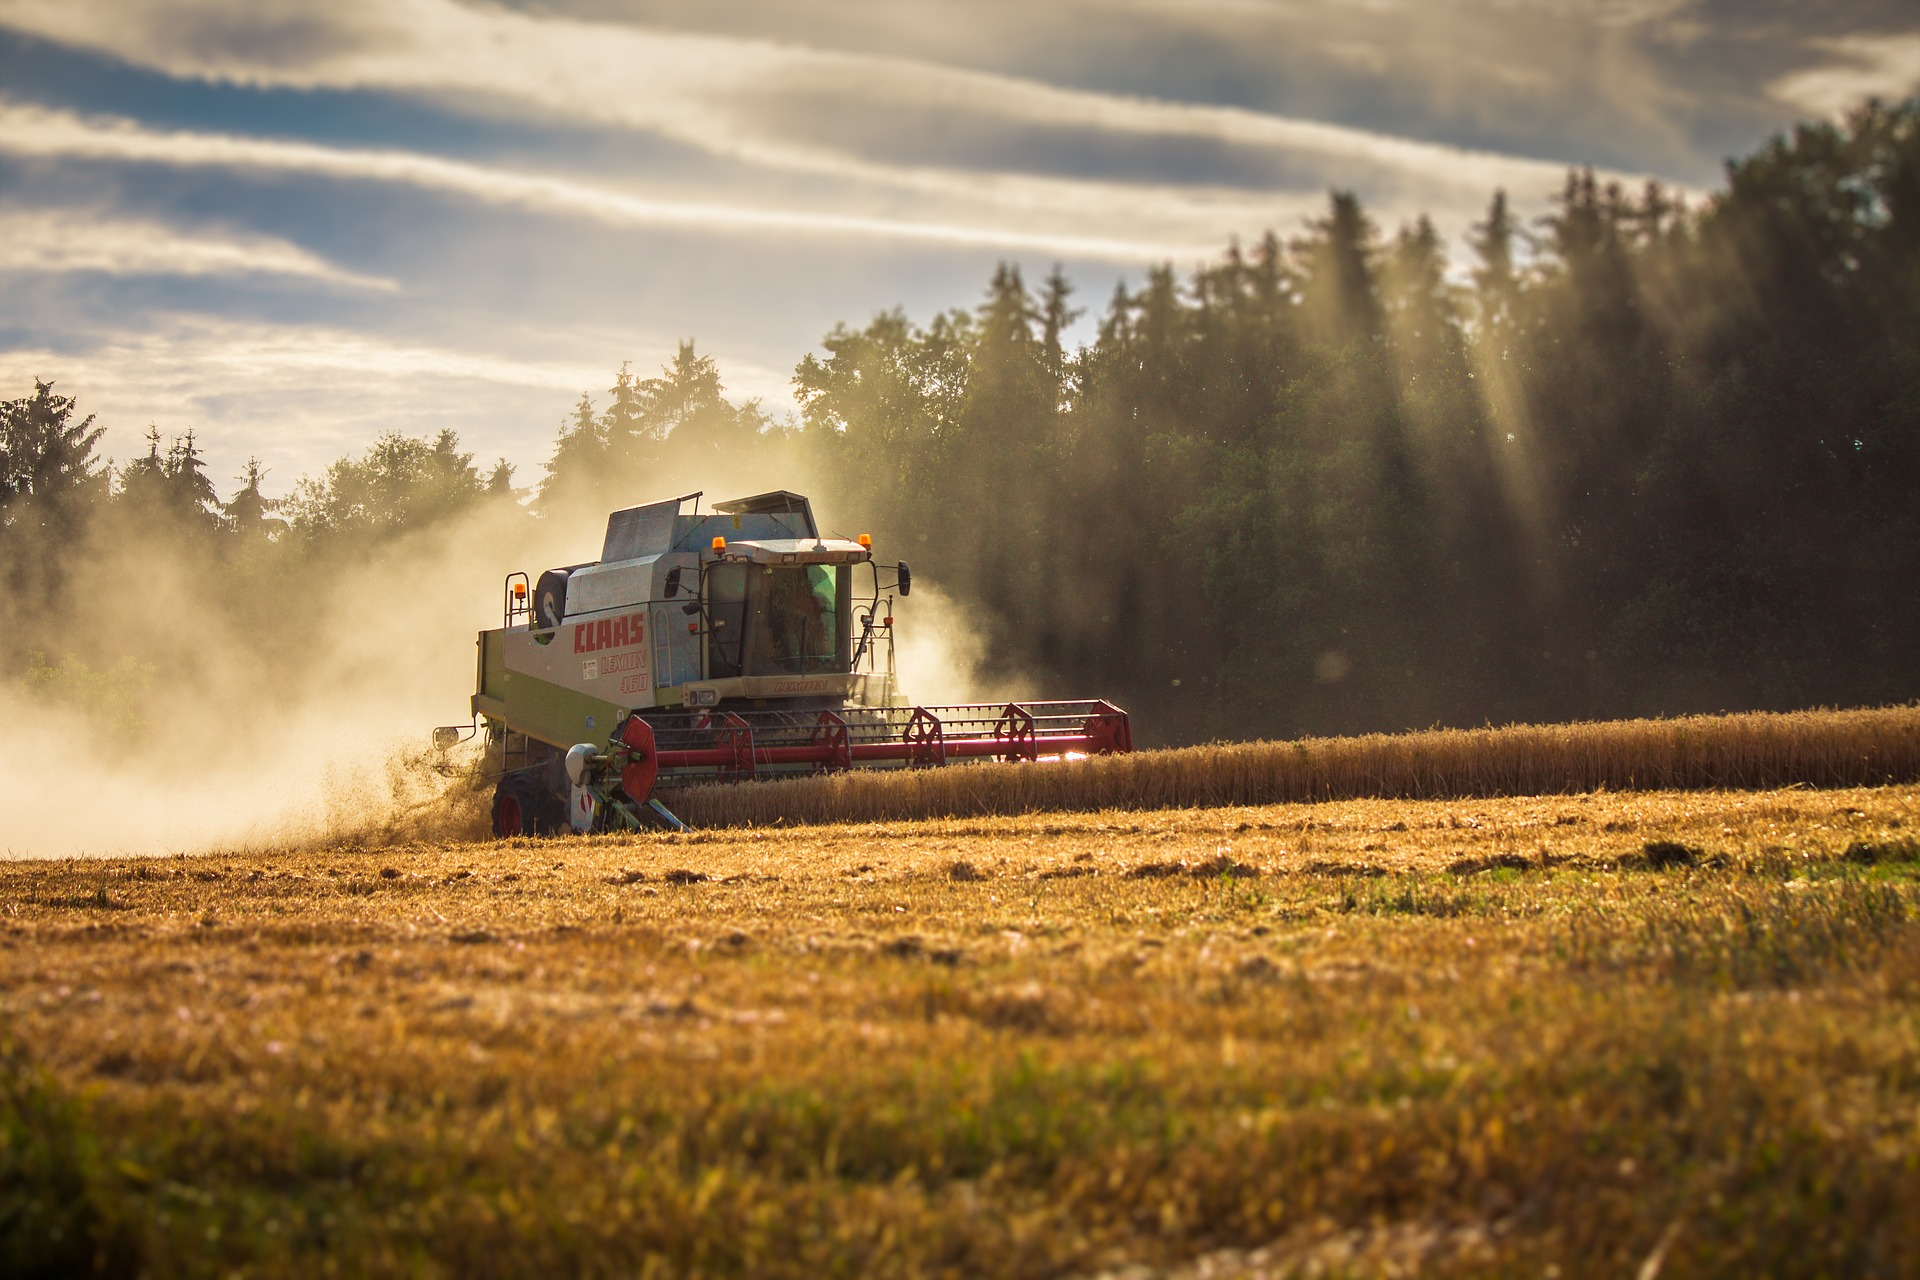 Україна стала шостою серед країн-постачальників агропродукції в ЄС